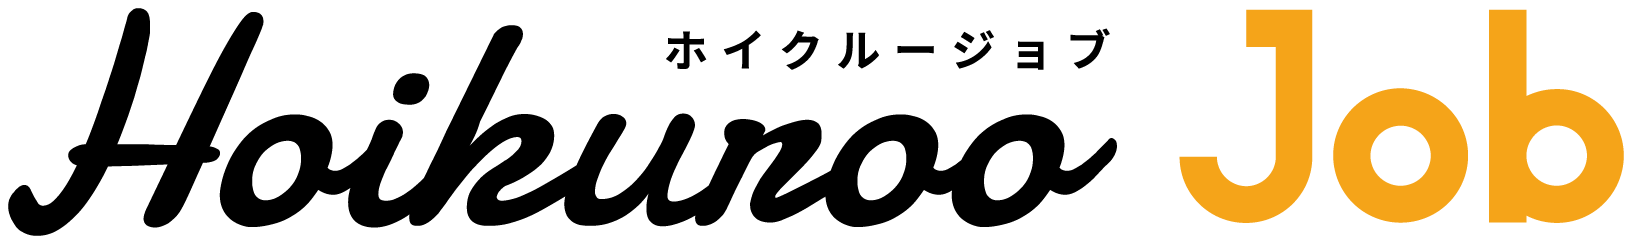 Hoikuroo Job(ホイクルージョブ)ロゴ